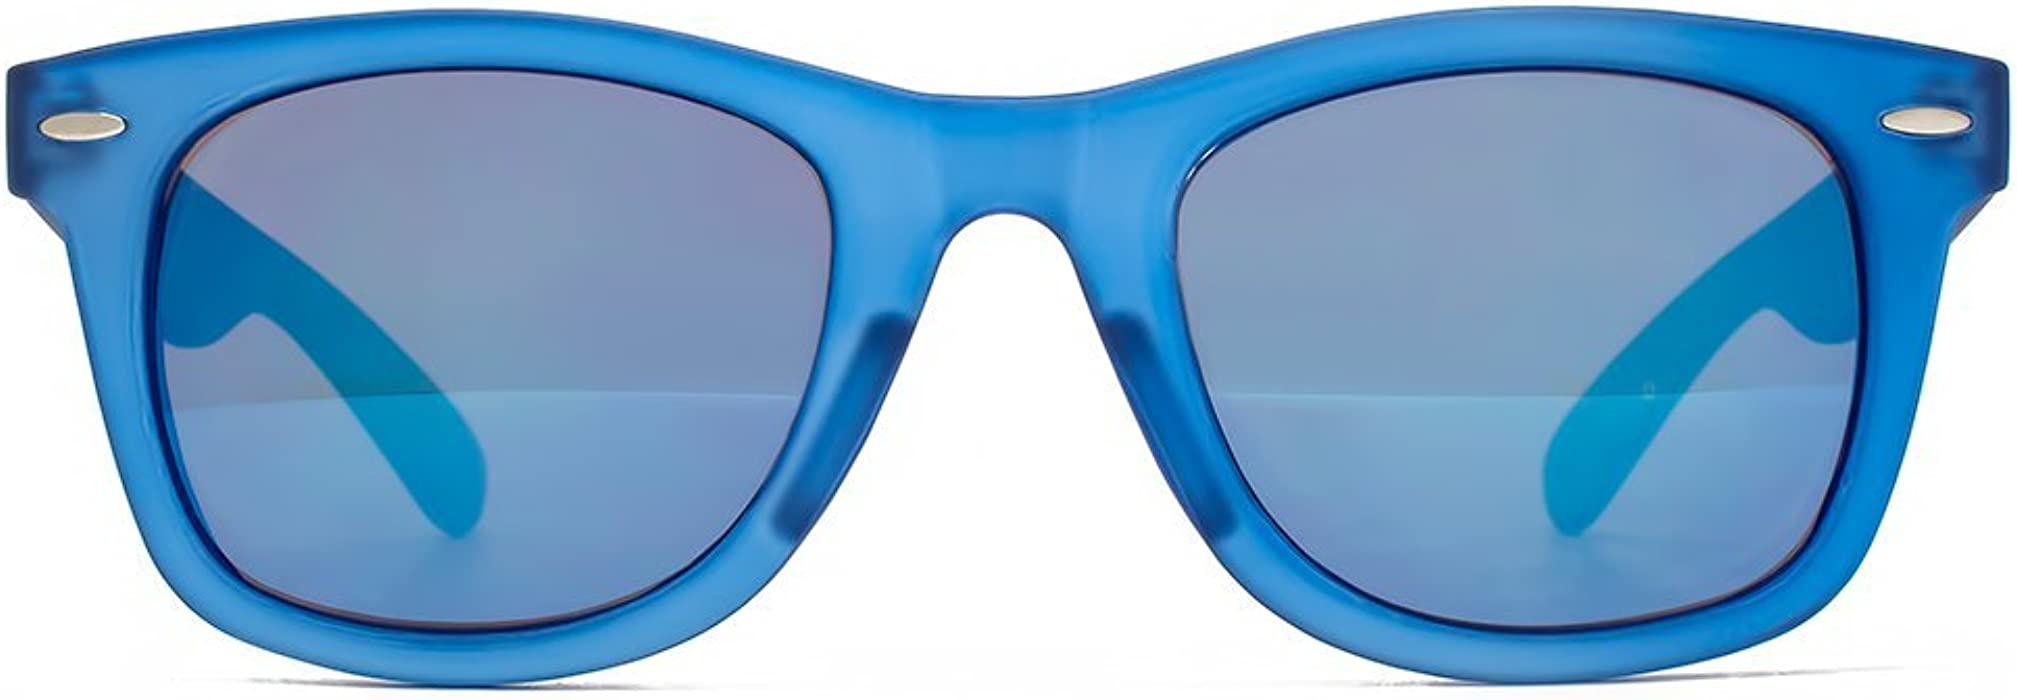 51cac628a9ec M:UK Brixton Wayfarer Style Sunglasses in Blue MUK147829: Amazon.co ...